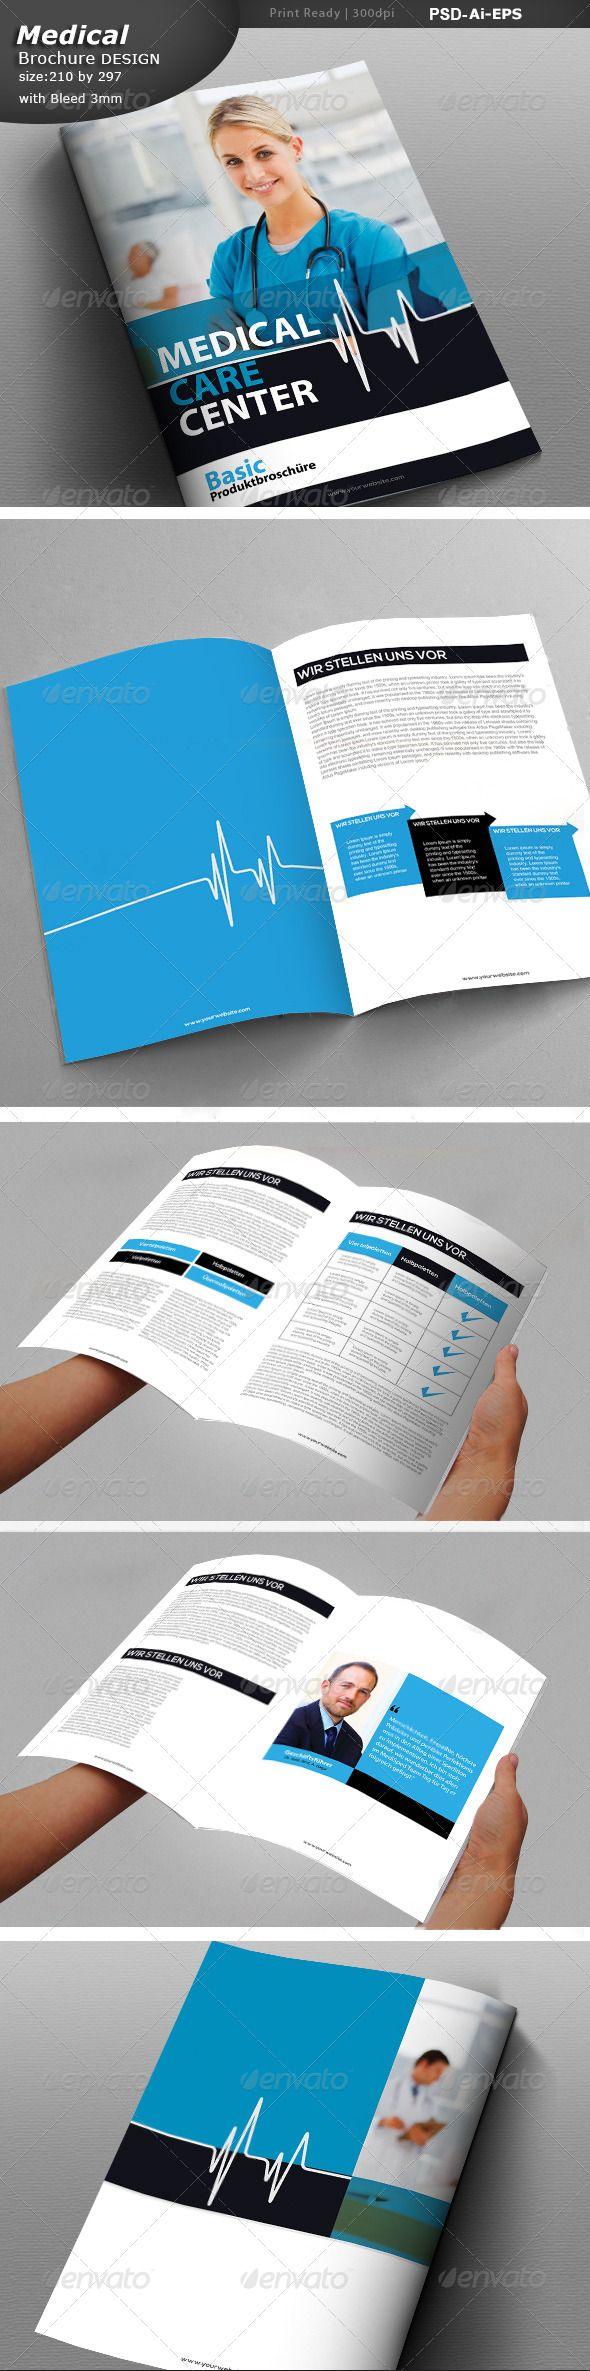 Medical Center Brochure Design   #graphicriver